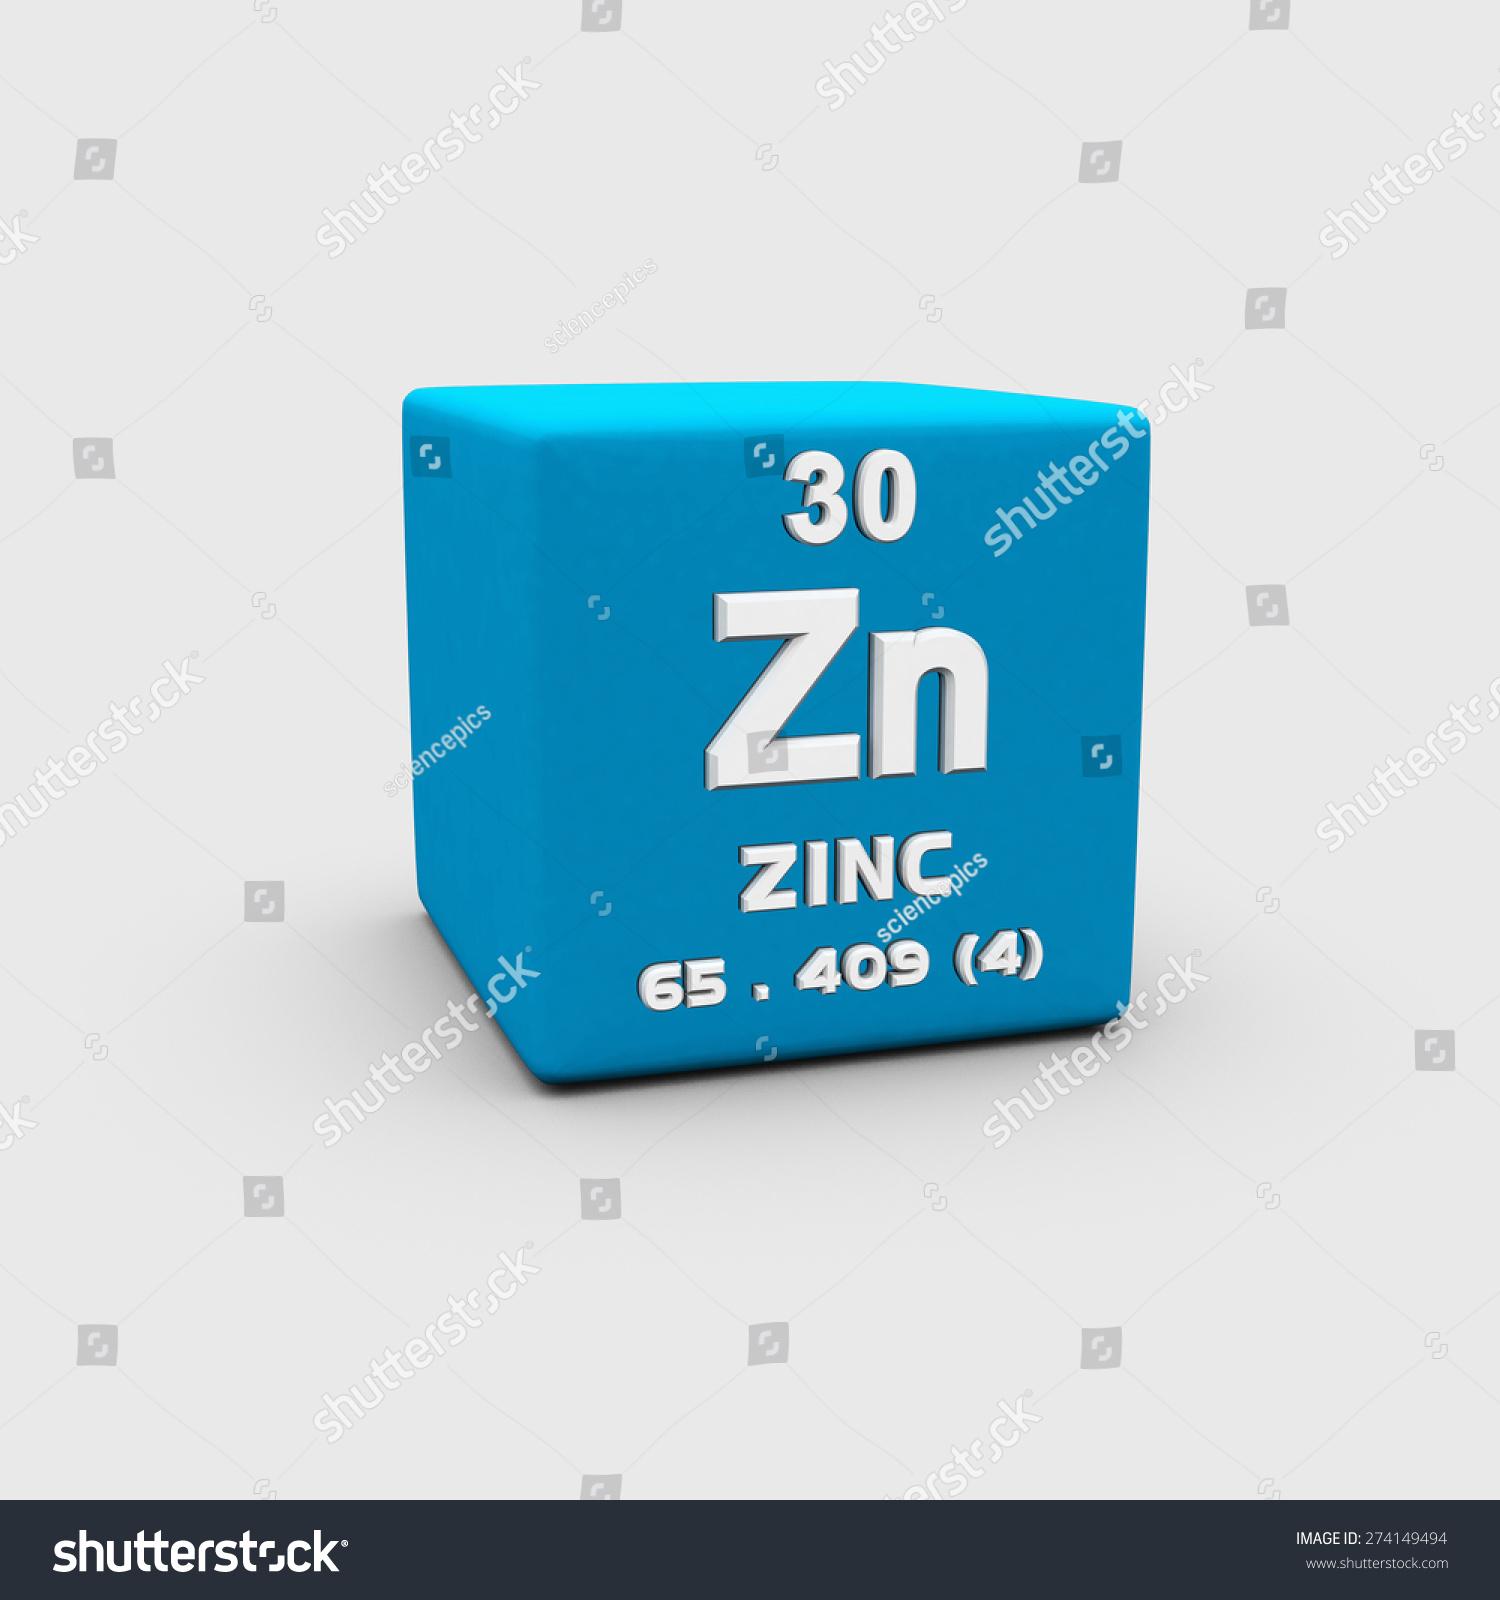 Atomic Number Zinc Stock Photo 274149494   Shutterstock